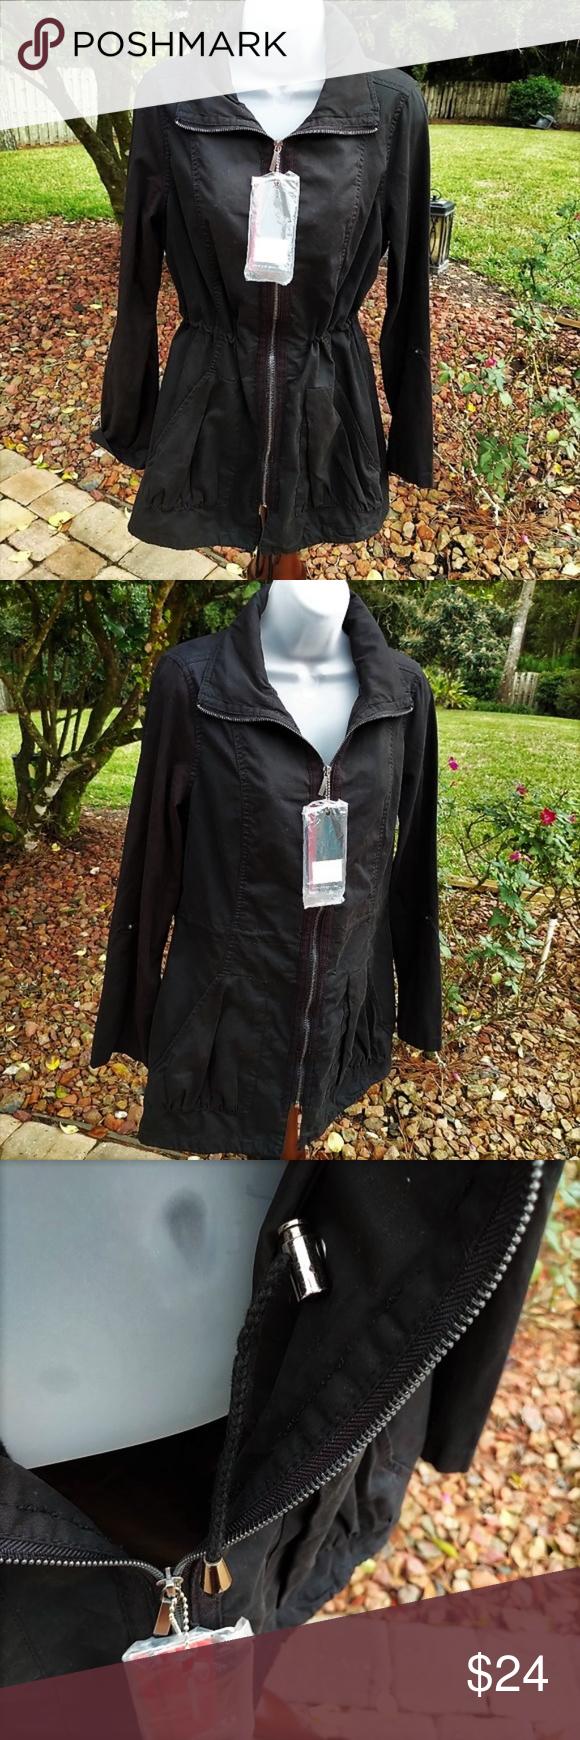 Yoki Outerwear Anorak Jacket Nwt M Clothes Design Fashion Design How To Roll Sleeves [ 1740 x 580 Pixel ]